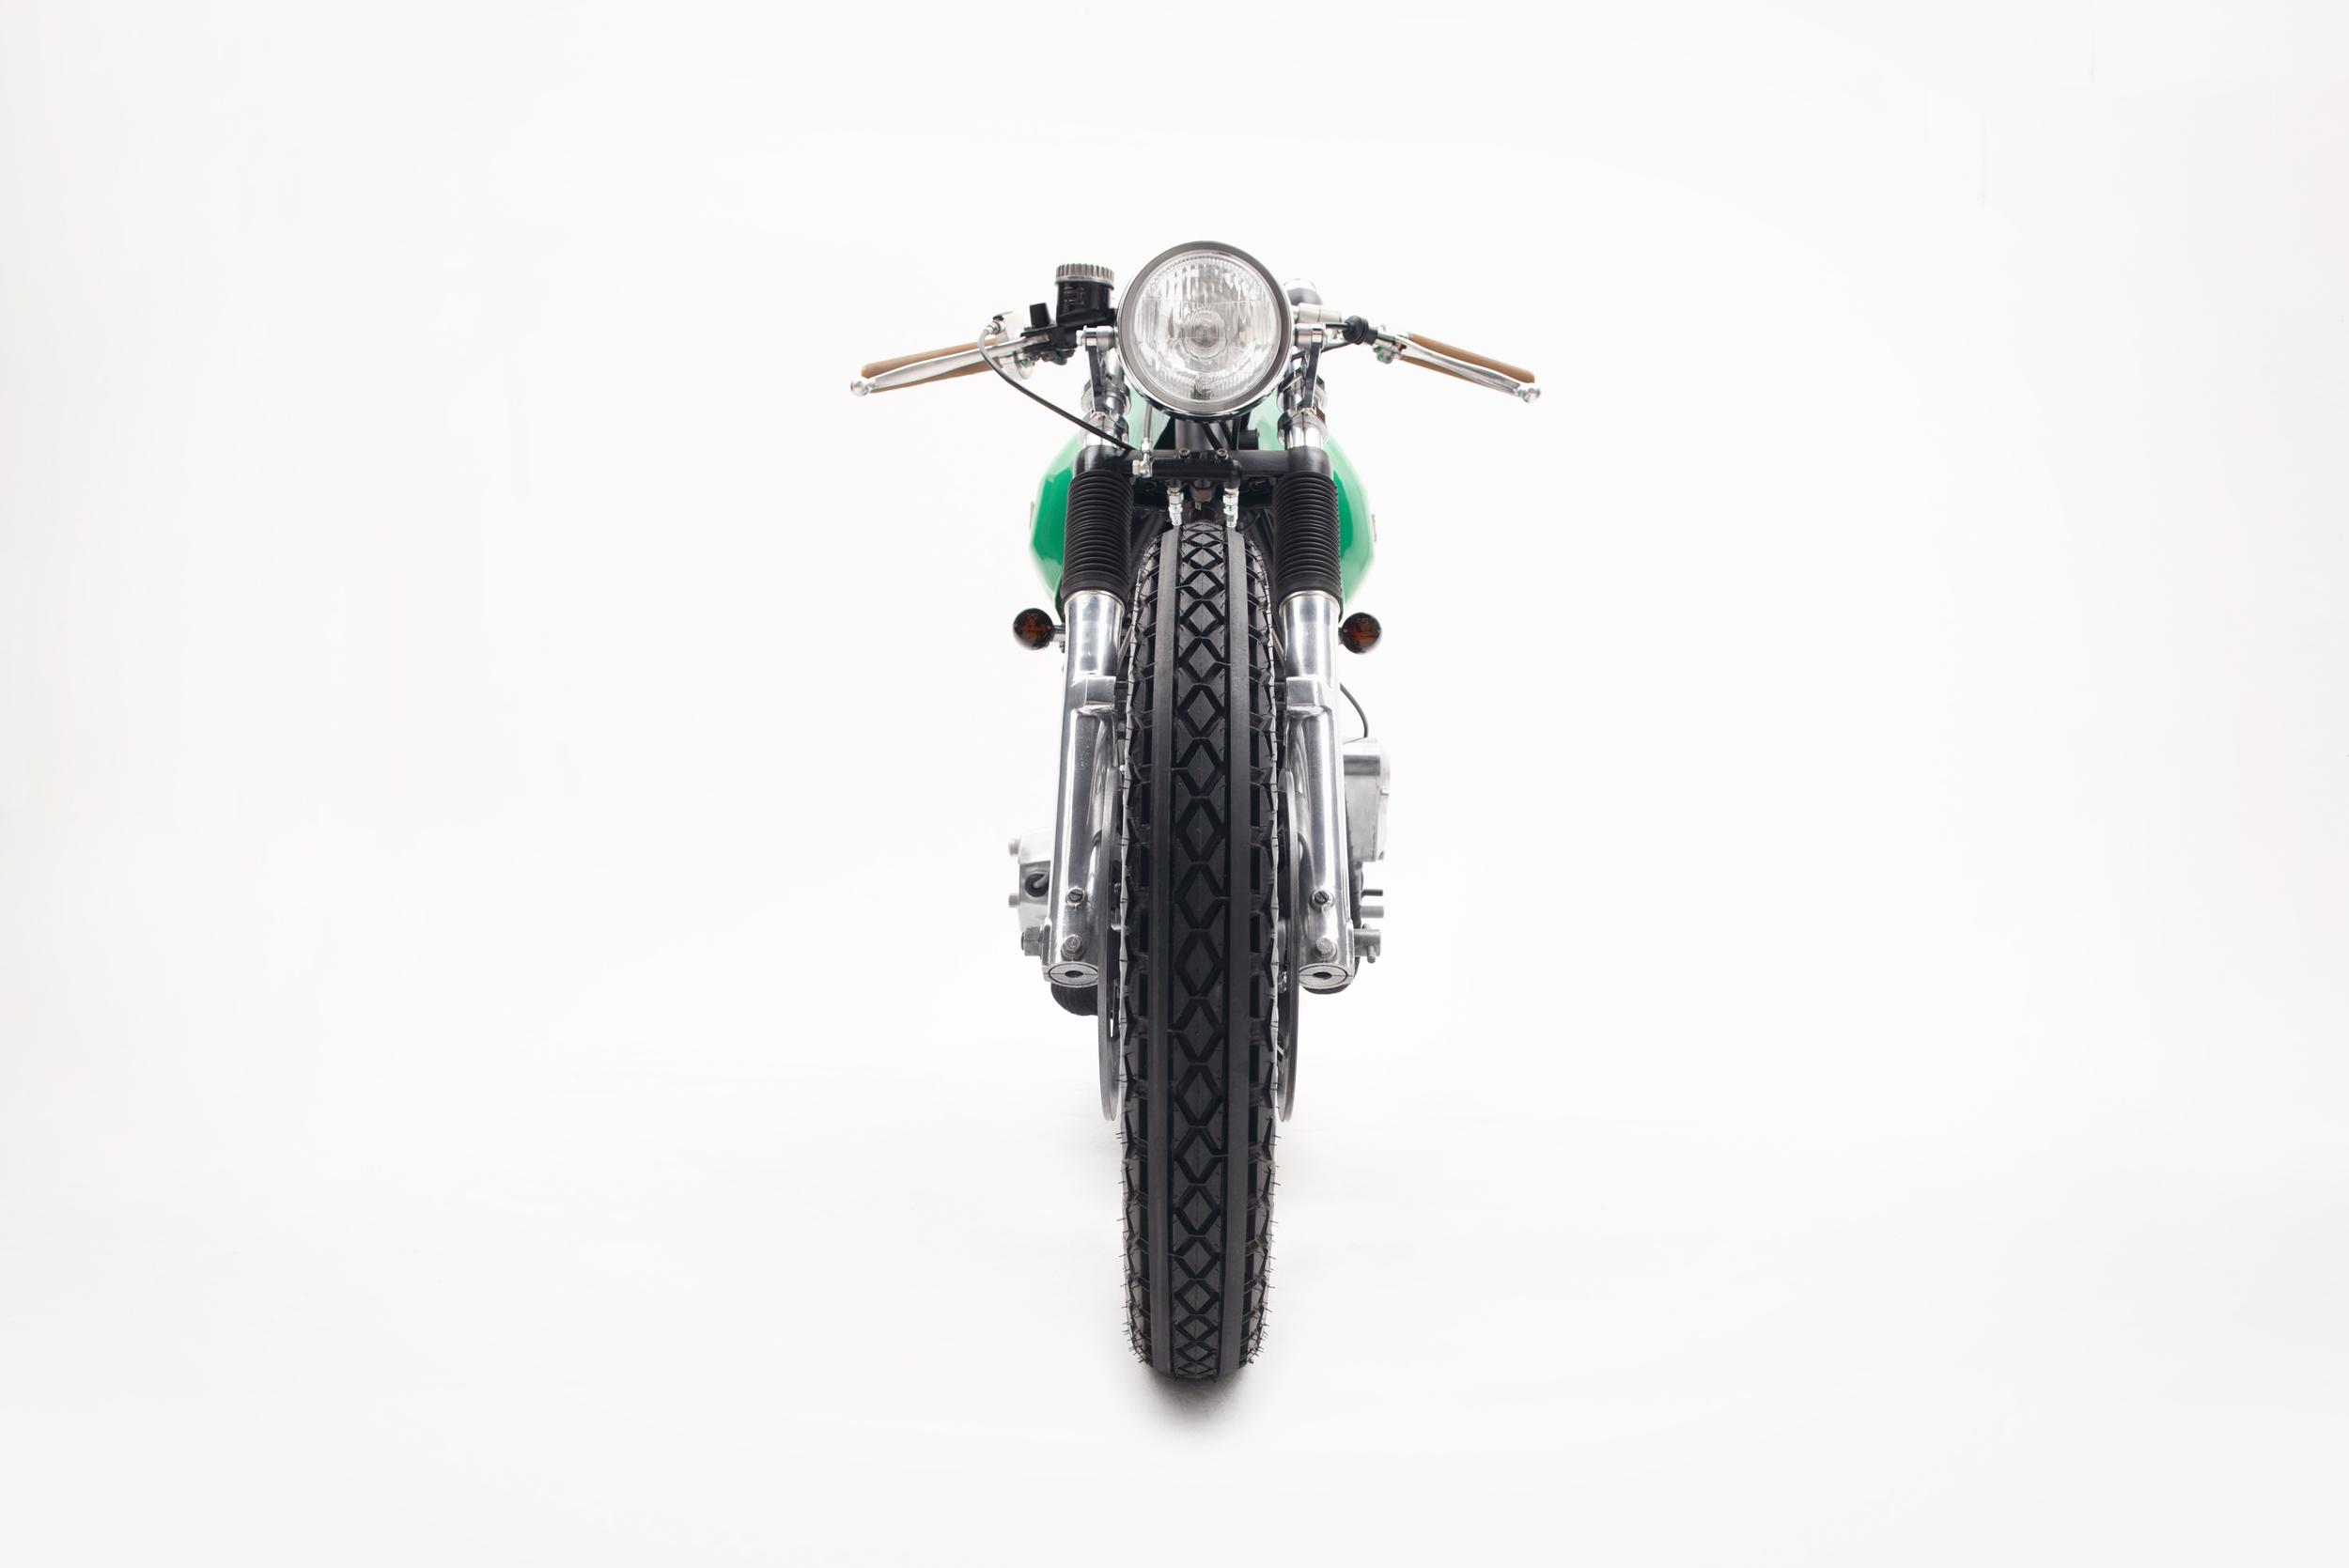 654Motors_Ducati_860_GTS_76_LowRes_07.jpg